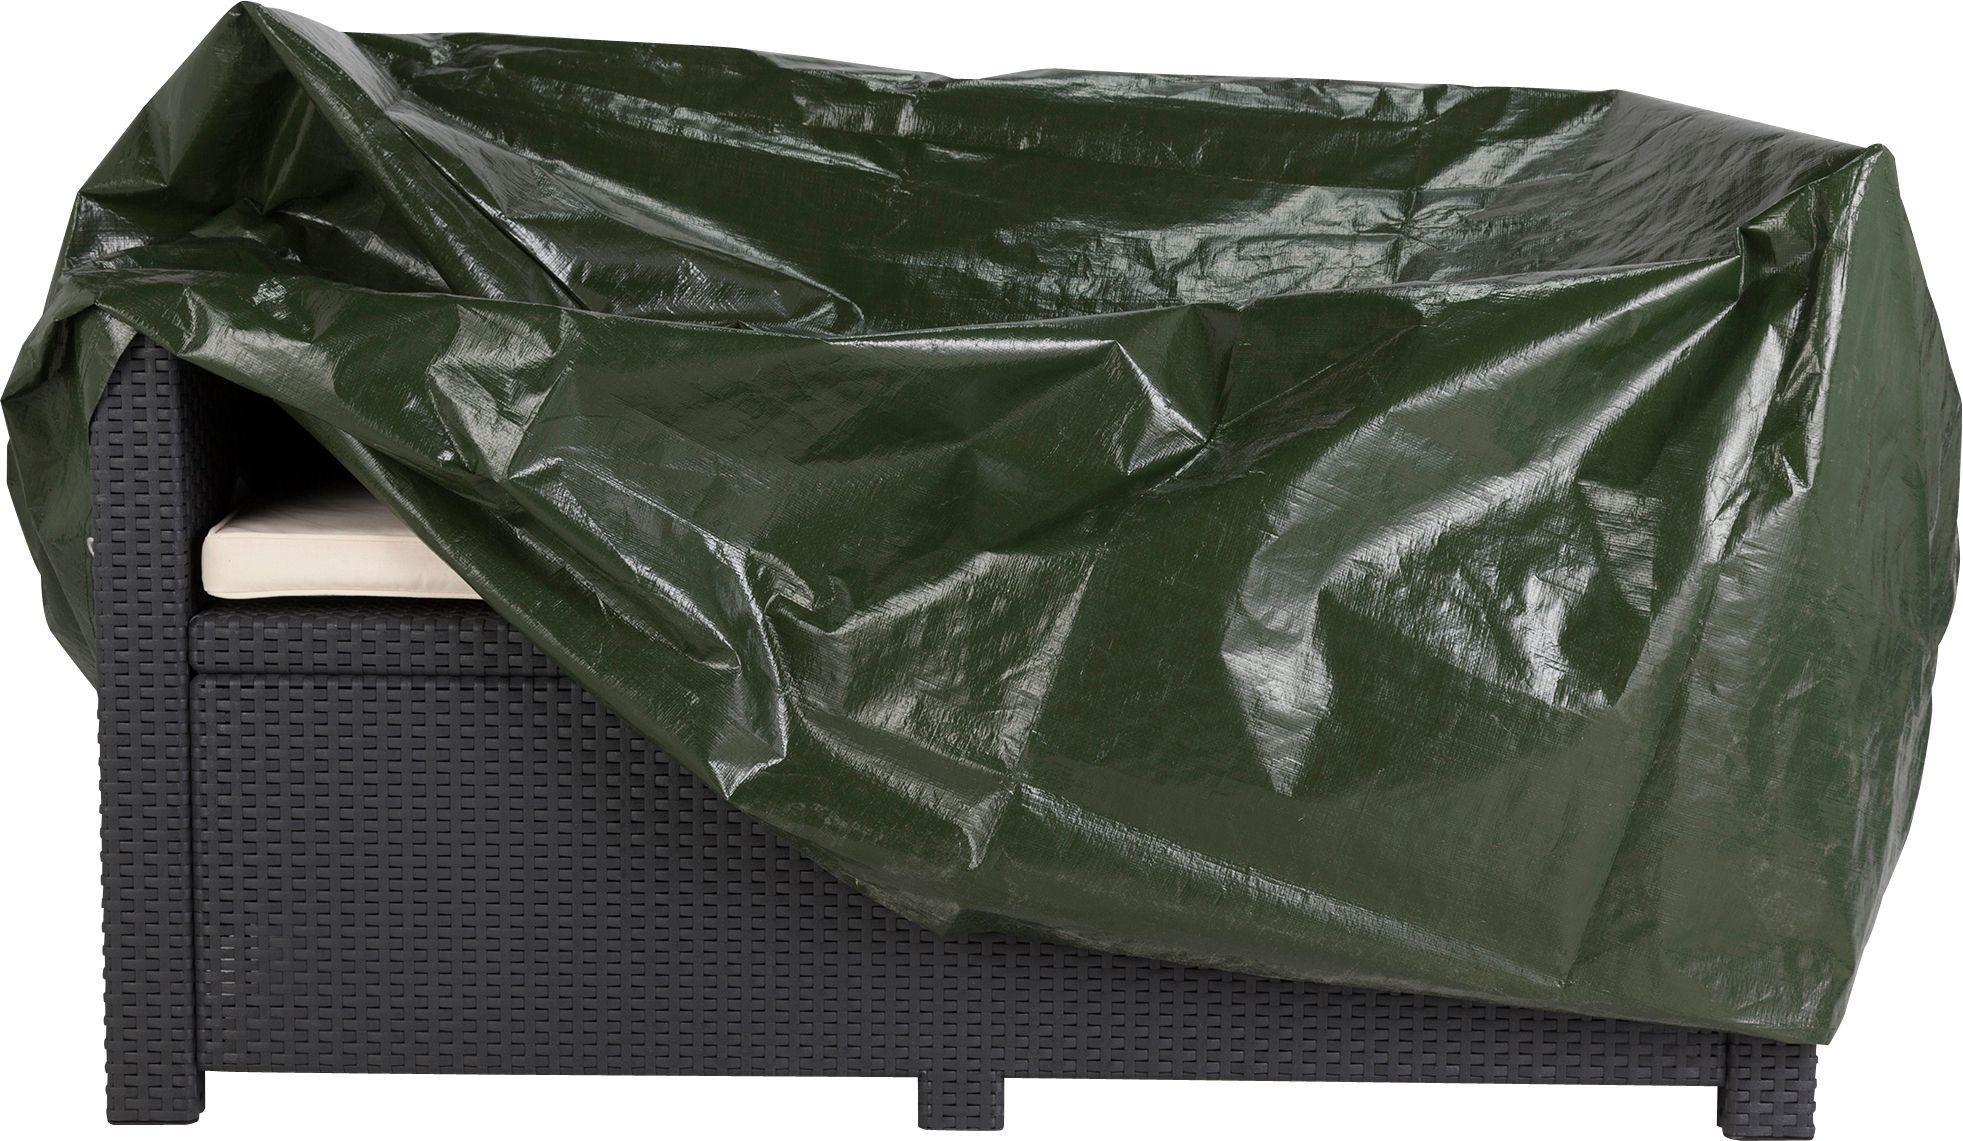 Argos Home - Standard Rattan - Garden Chair Cover - Set of 2